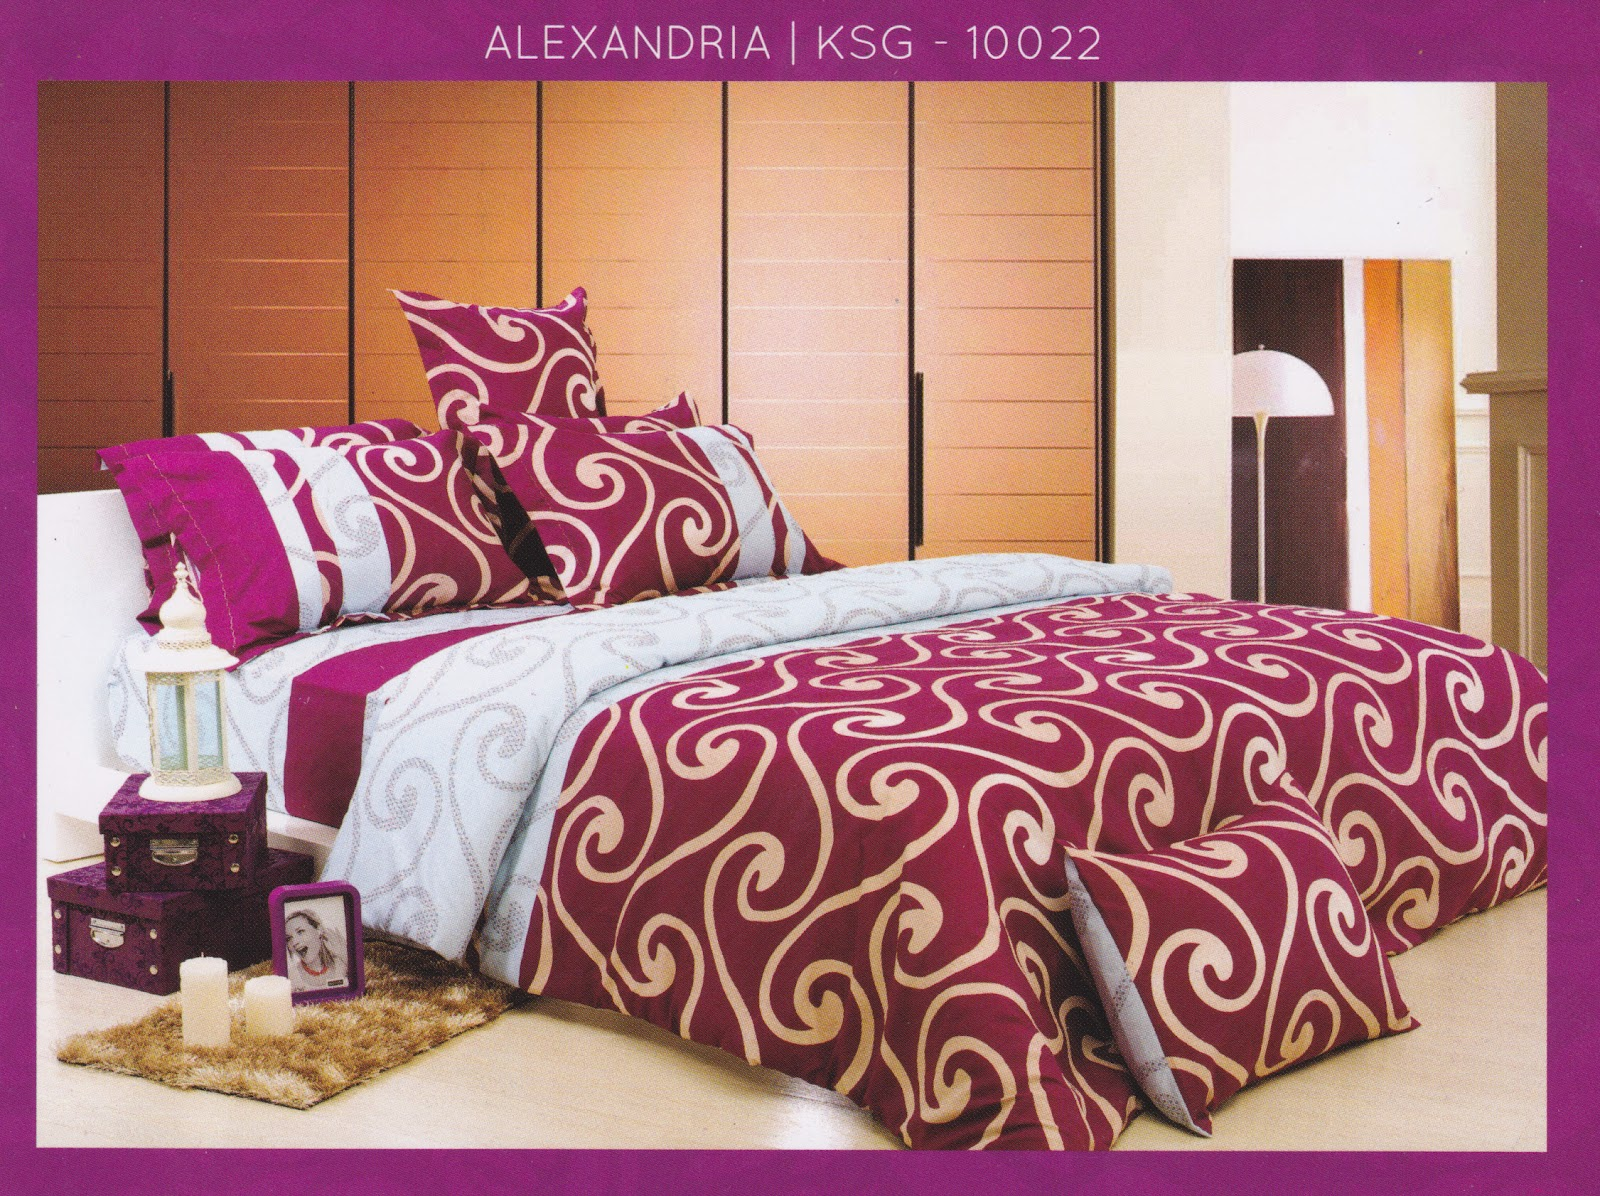 Sprei Kendra Signature Alexandria Ko Line Bed Cover Murah Jual